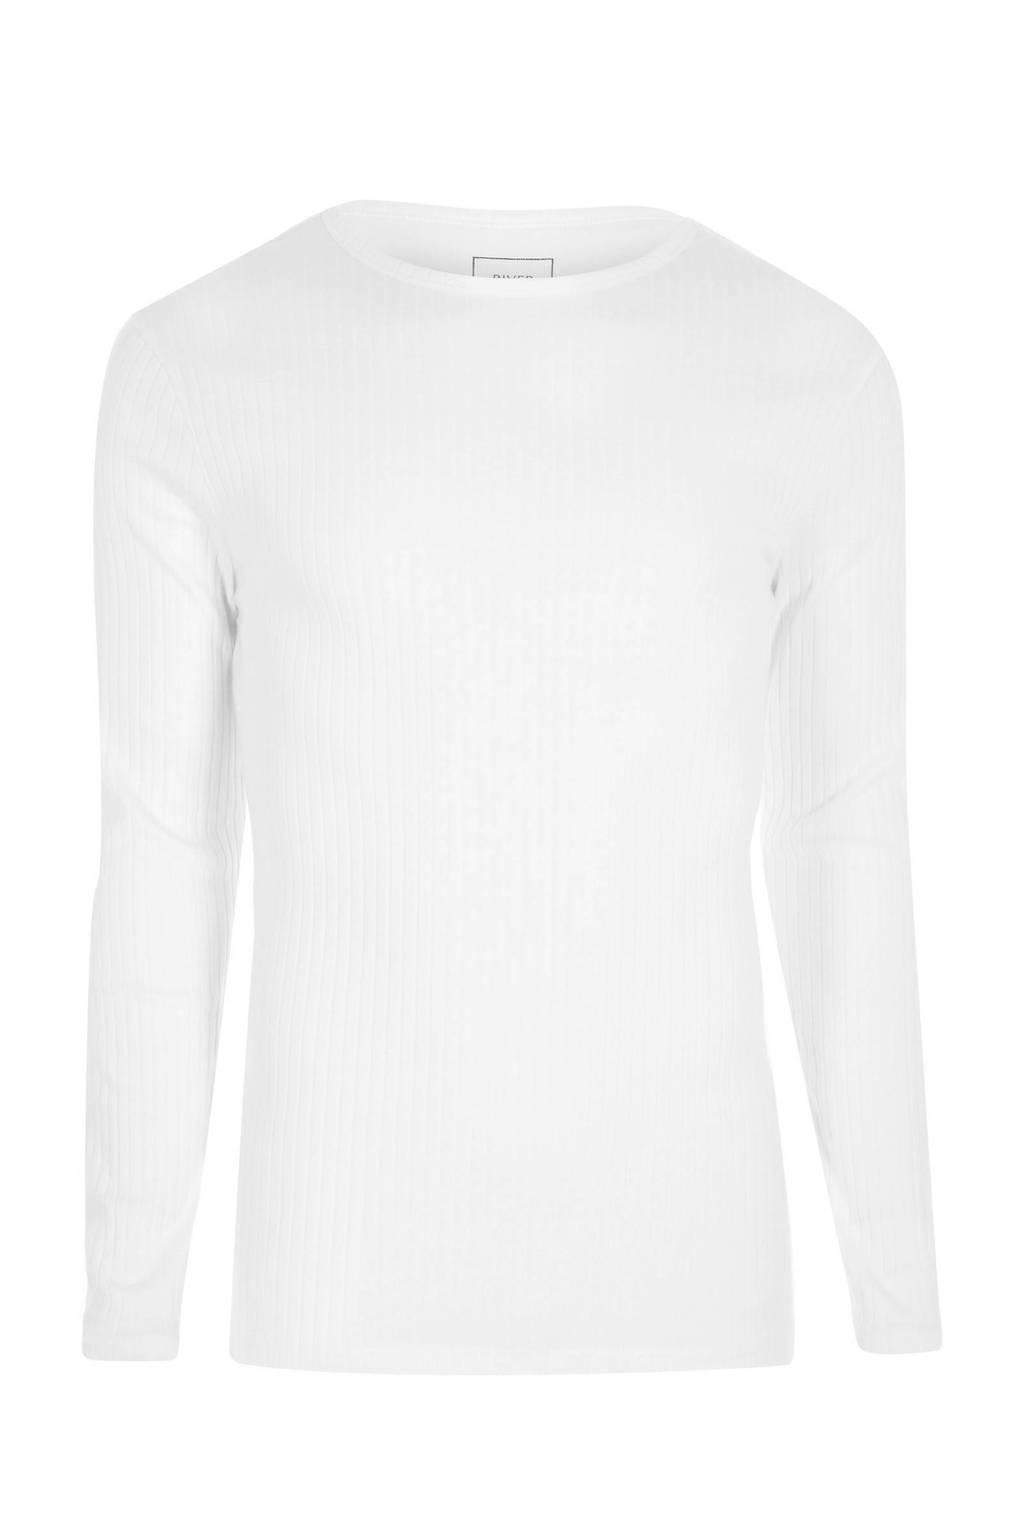 River Island T-shirt lange mouw, Wit